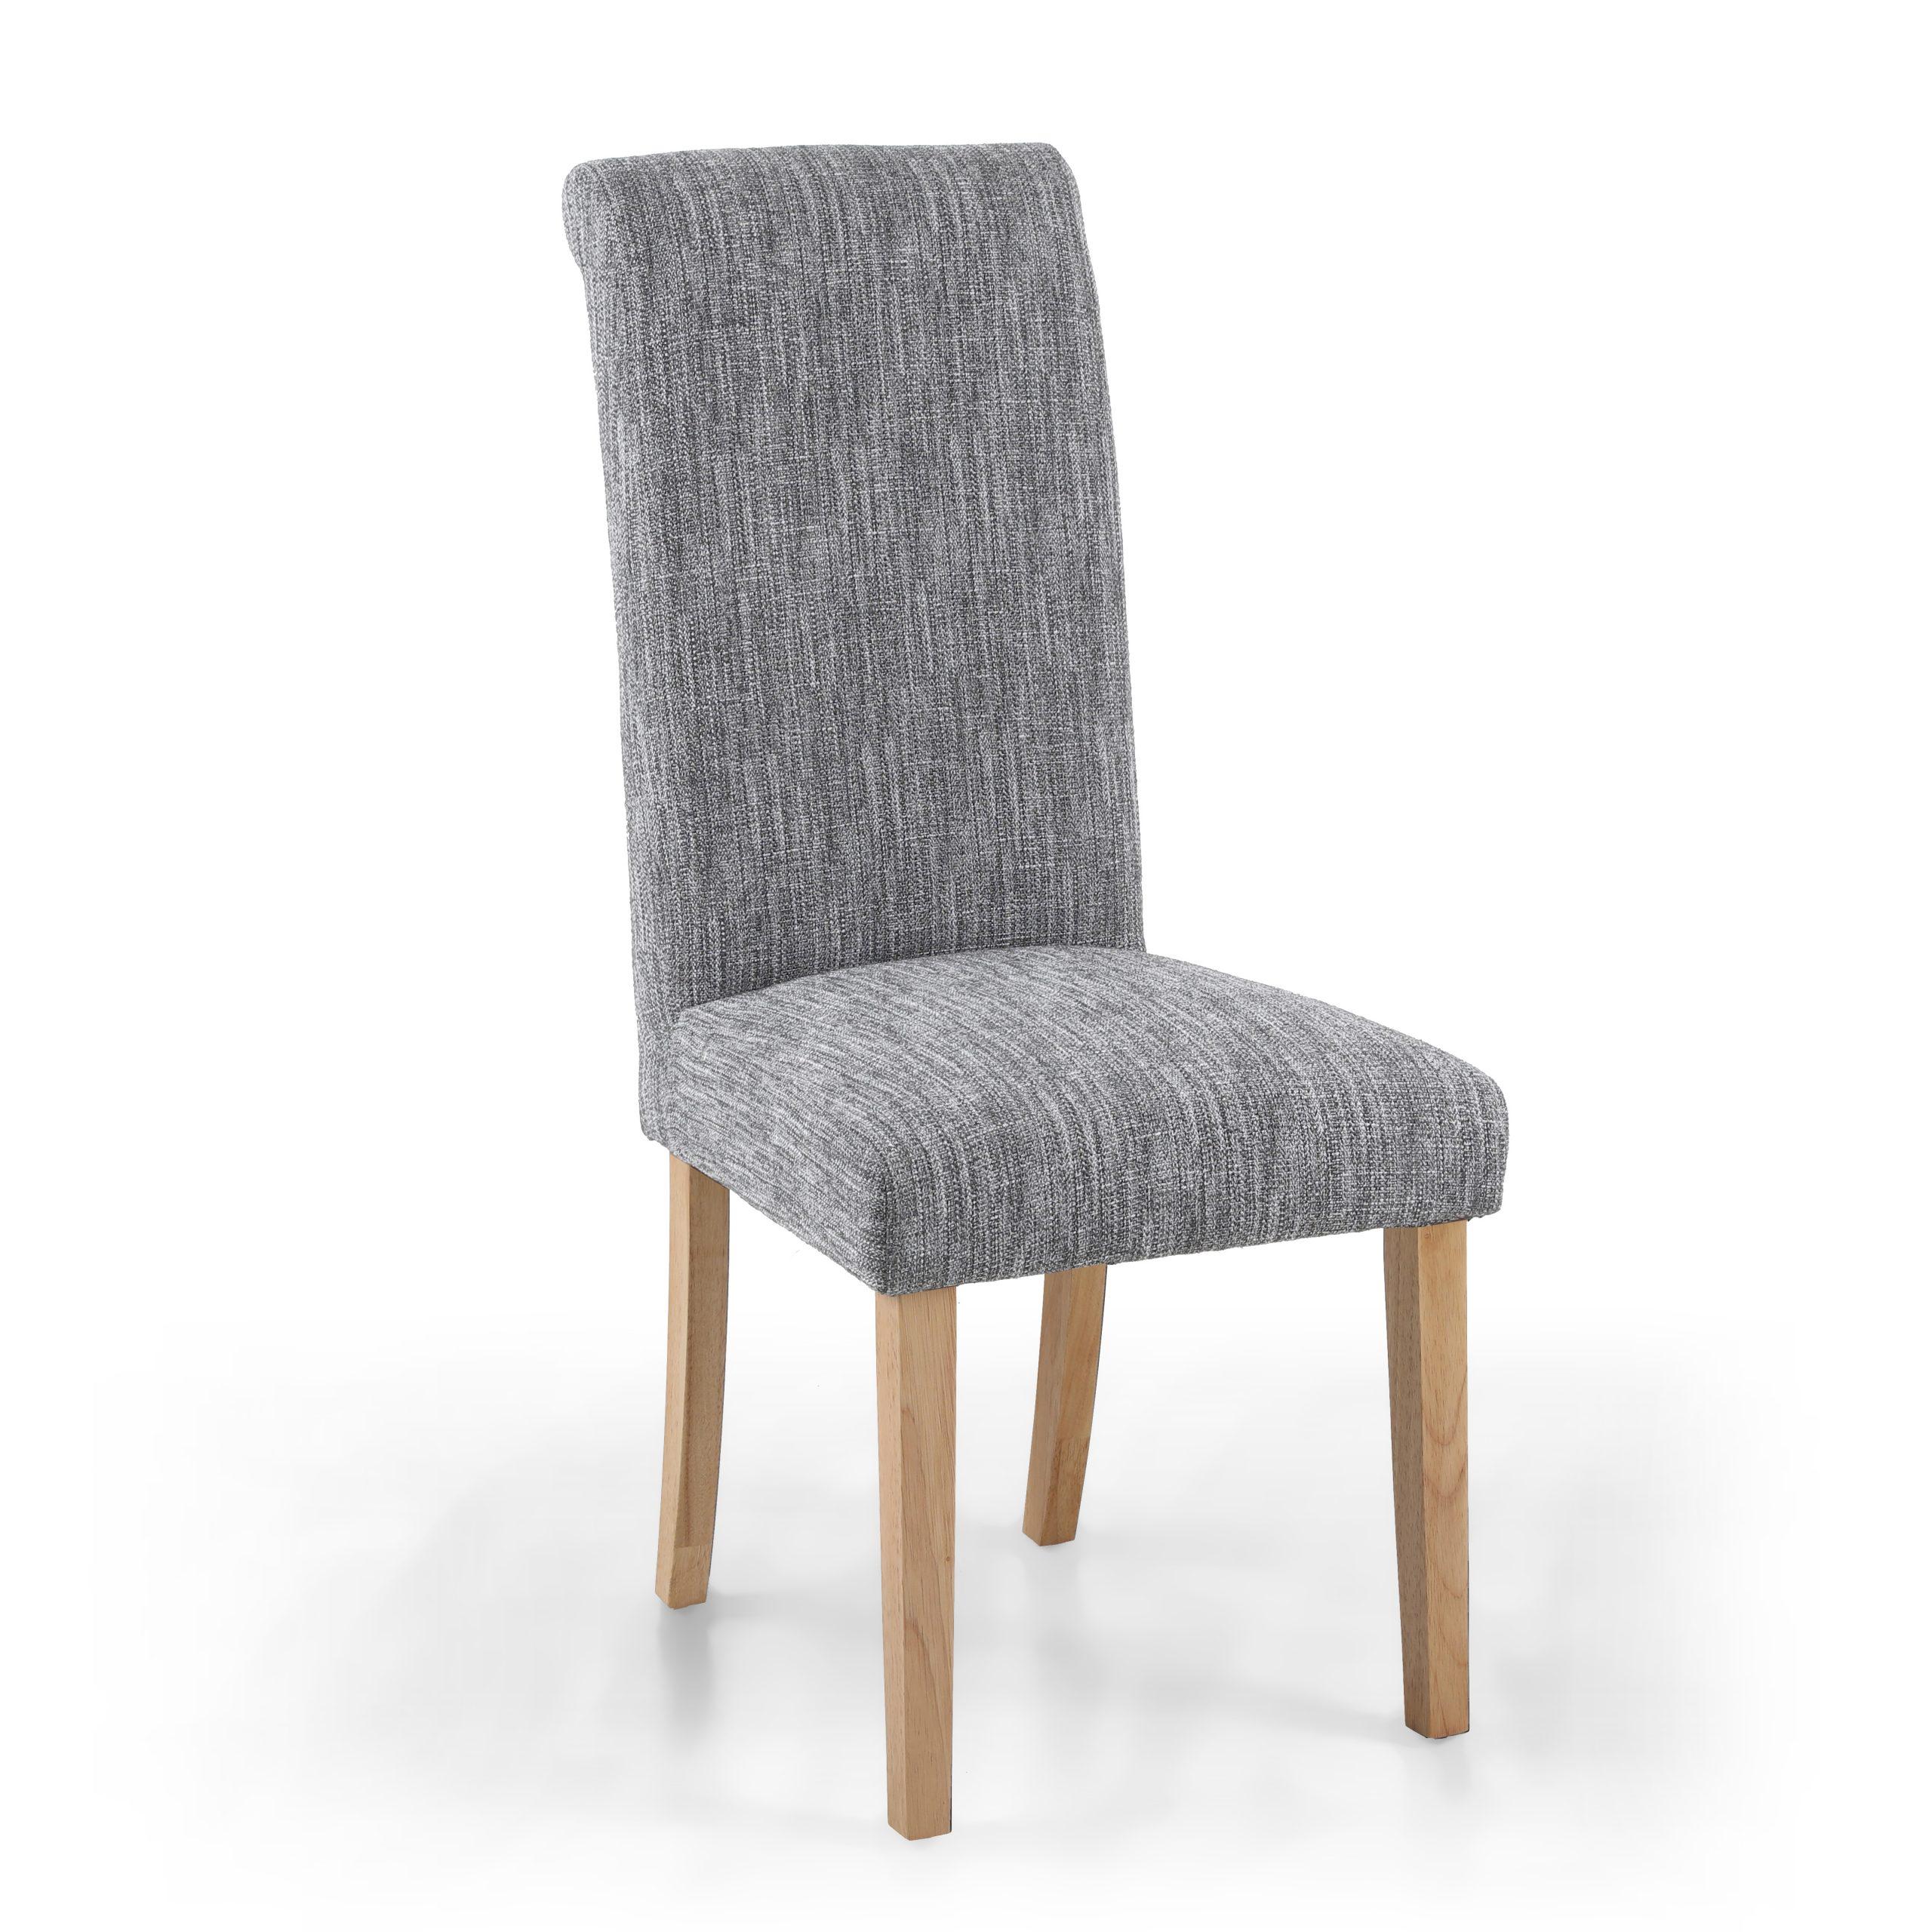 Bexley Light Grey linen fabric dining chair